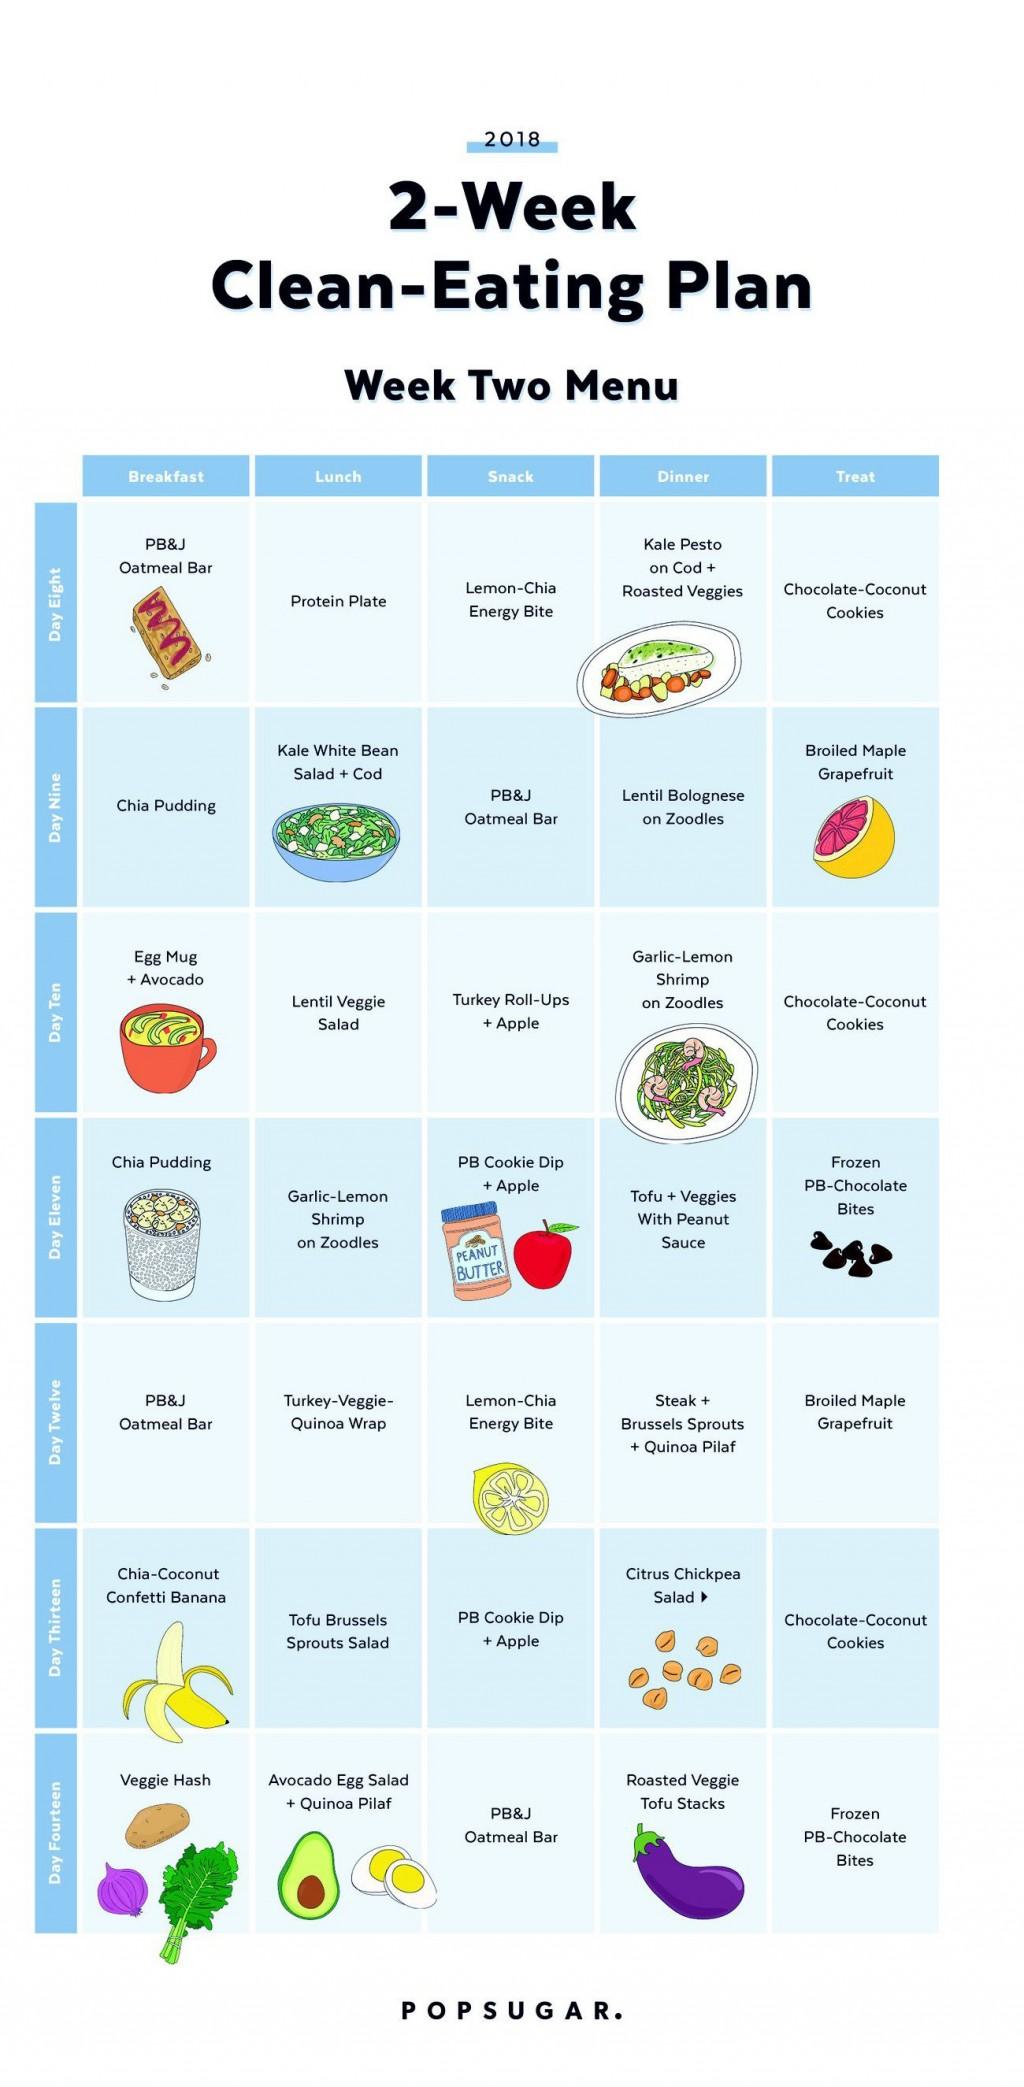 007 Wonderful 2 Week Meal Plan Printable Design Large